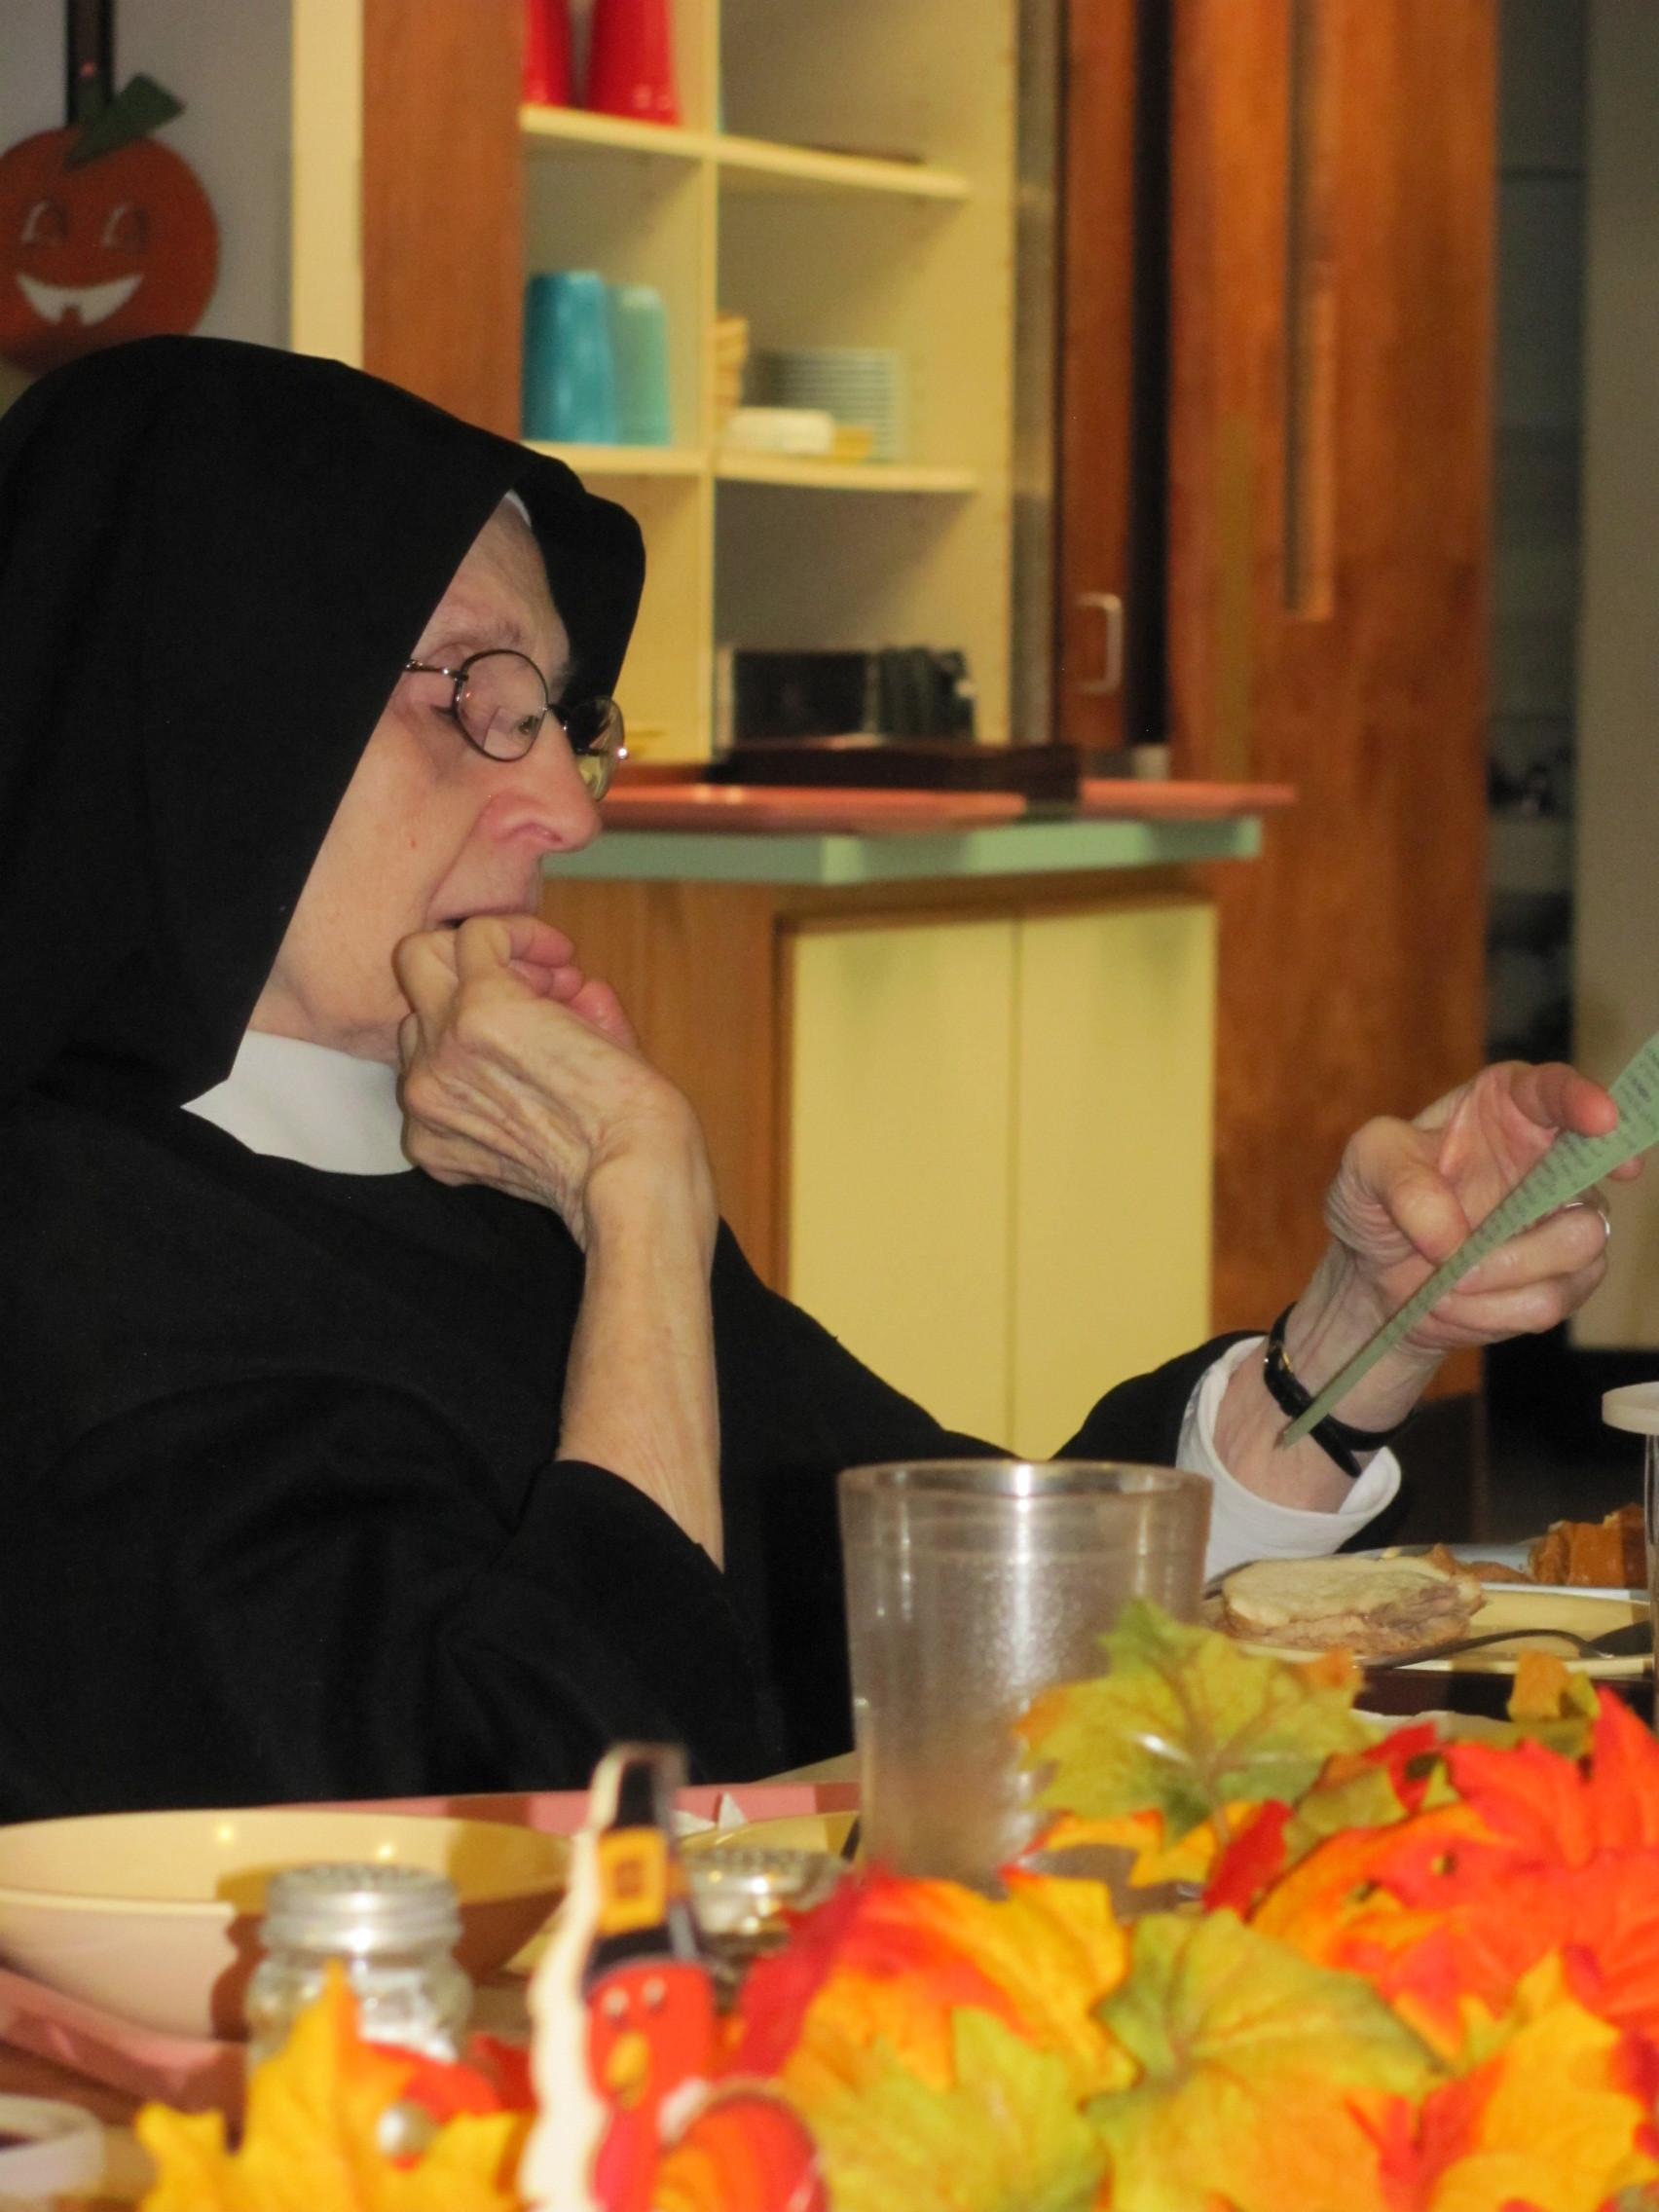 Sister Mary Elizabeth of the Running Walker